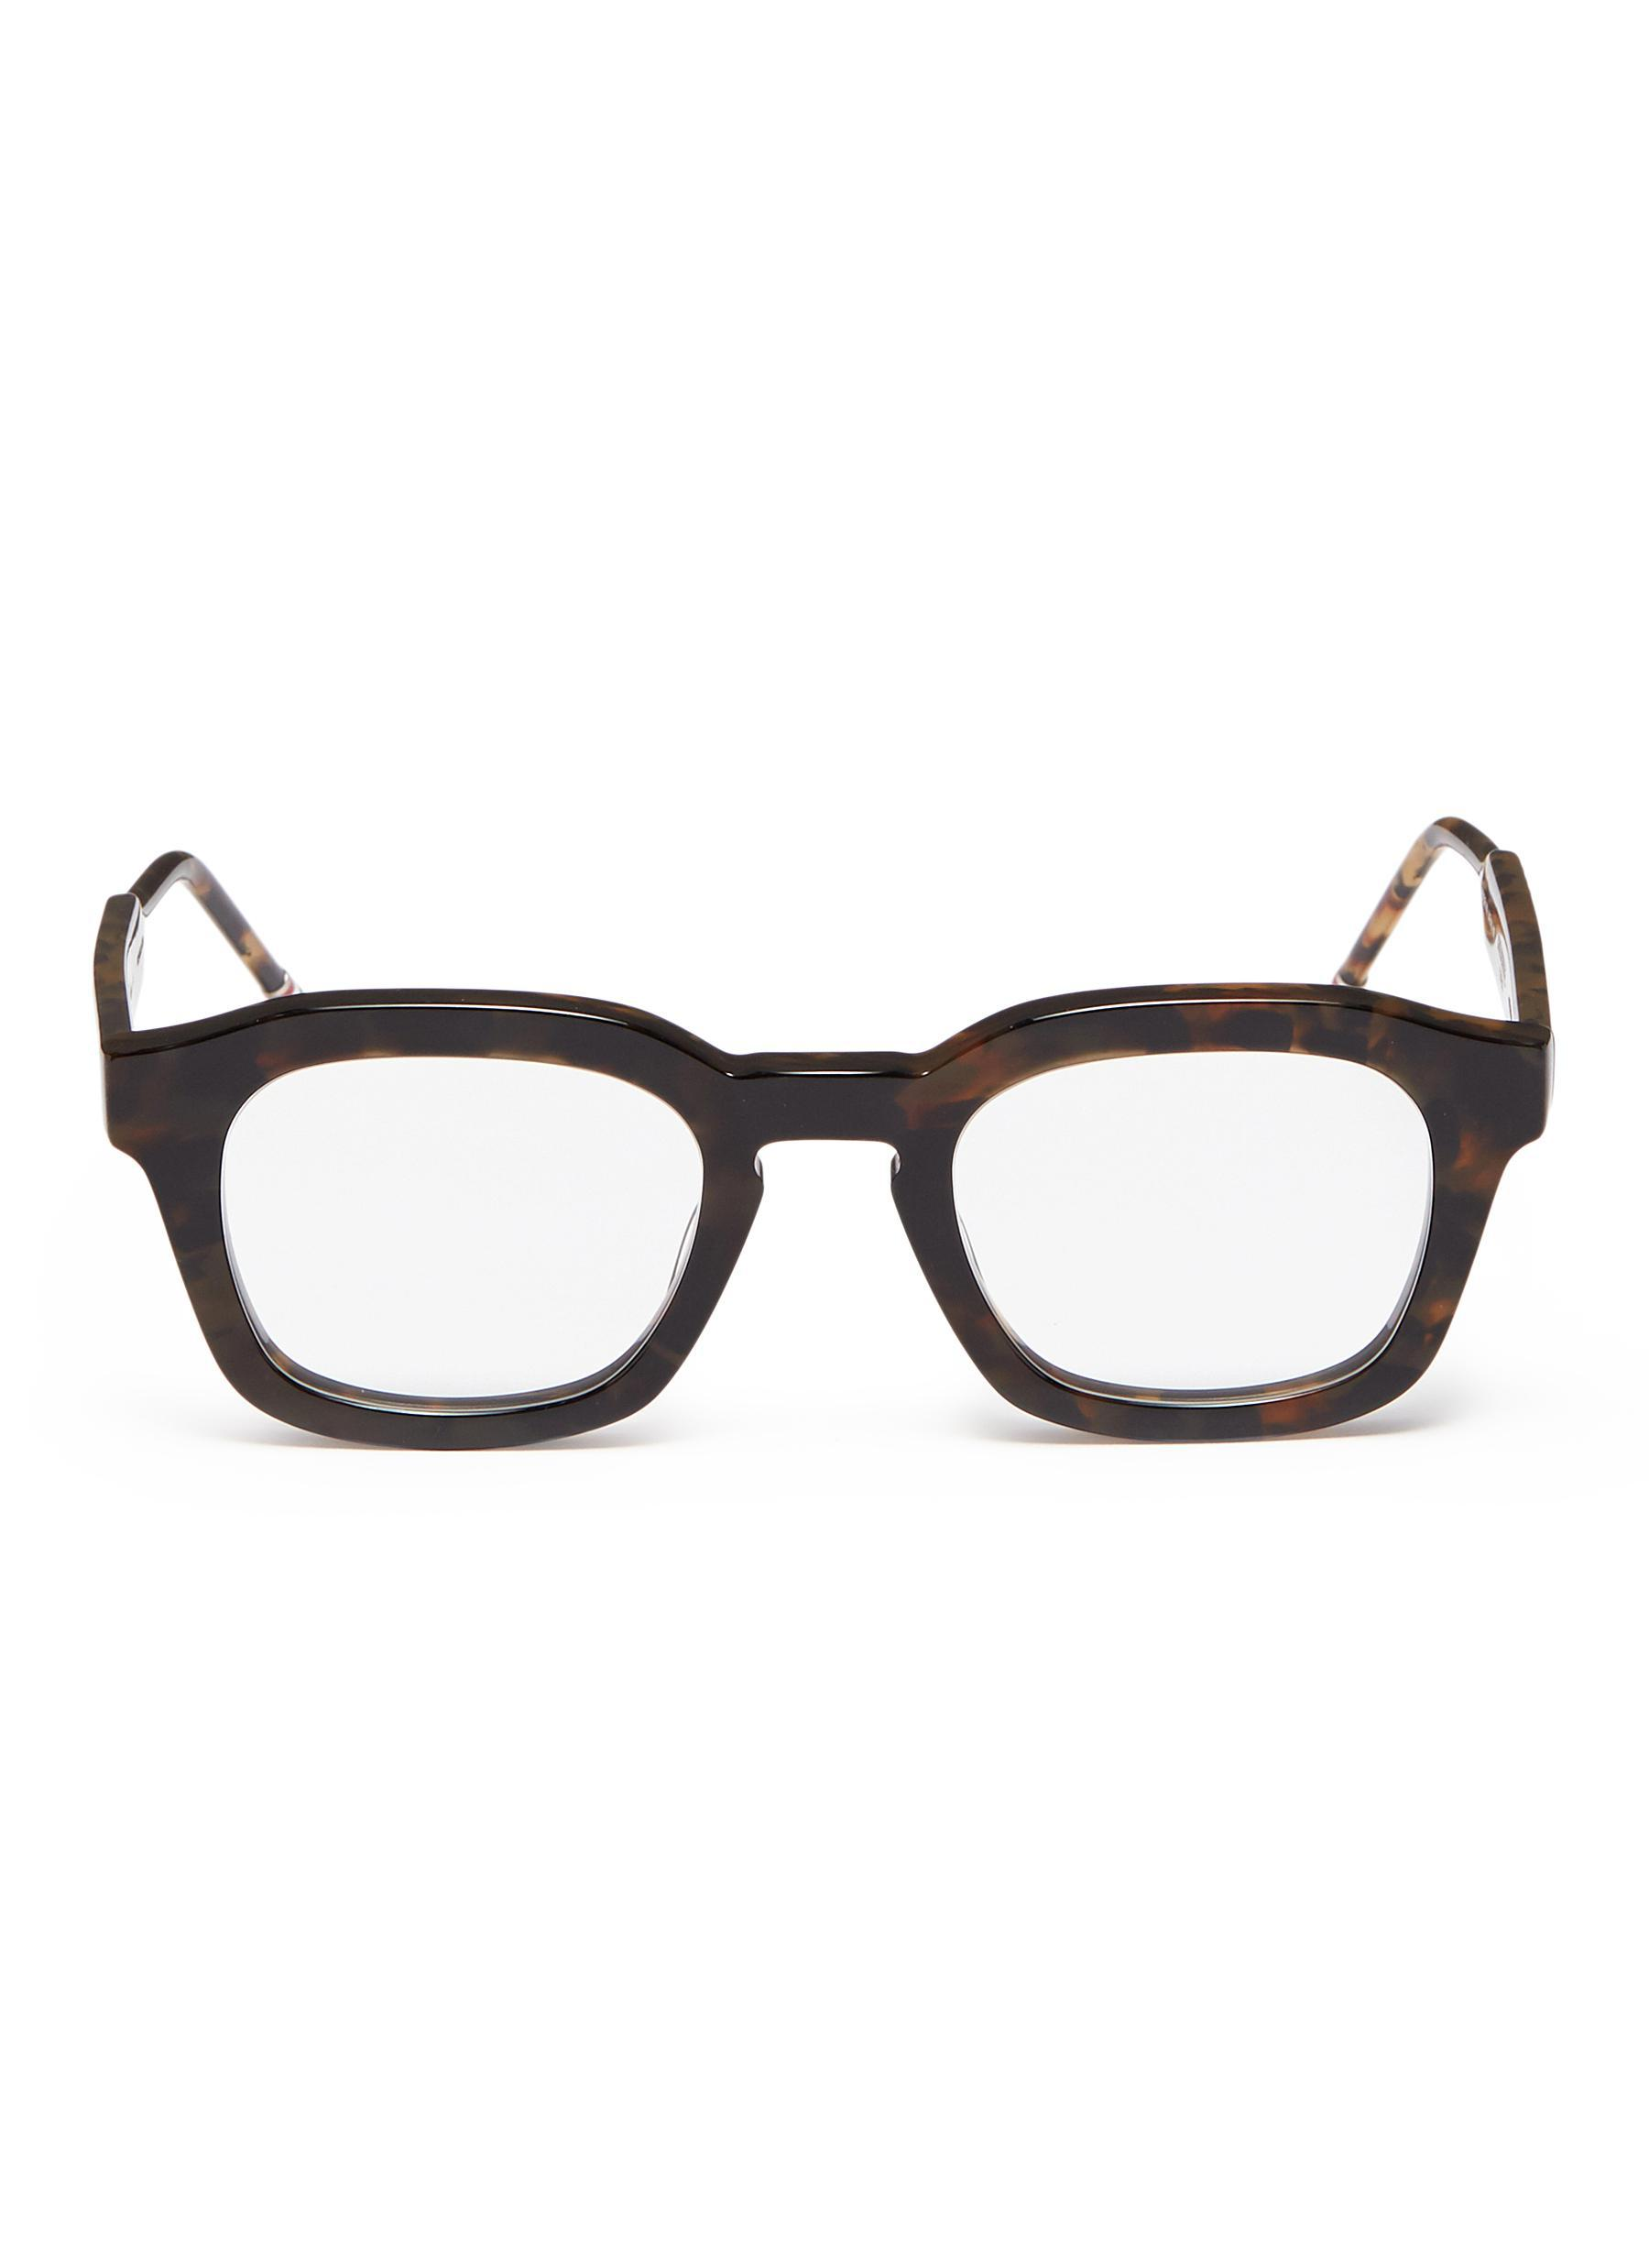 135d797ac9 Thom Browne. Men s Brown  tokyo  Tortoiseshell Acetate Square Optical  Glasses